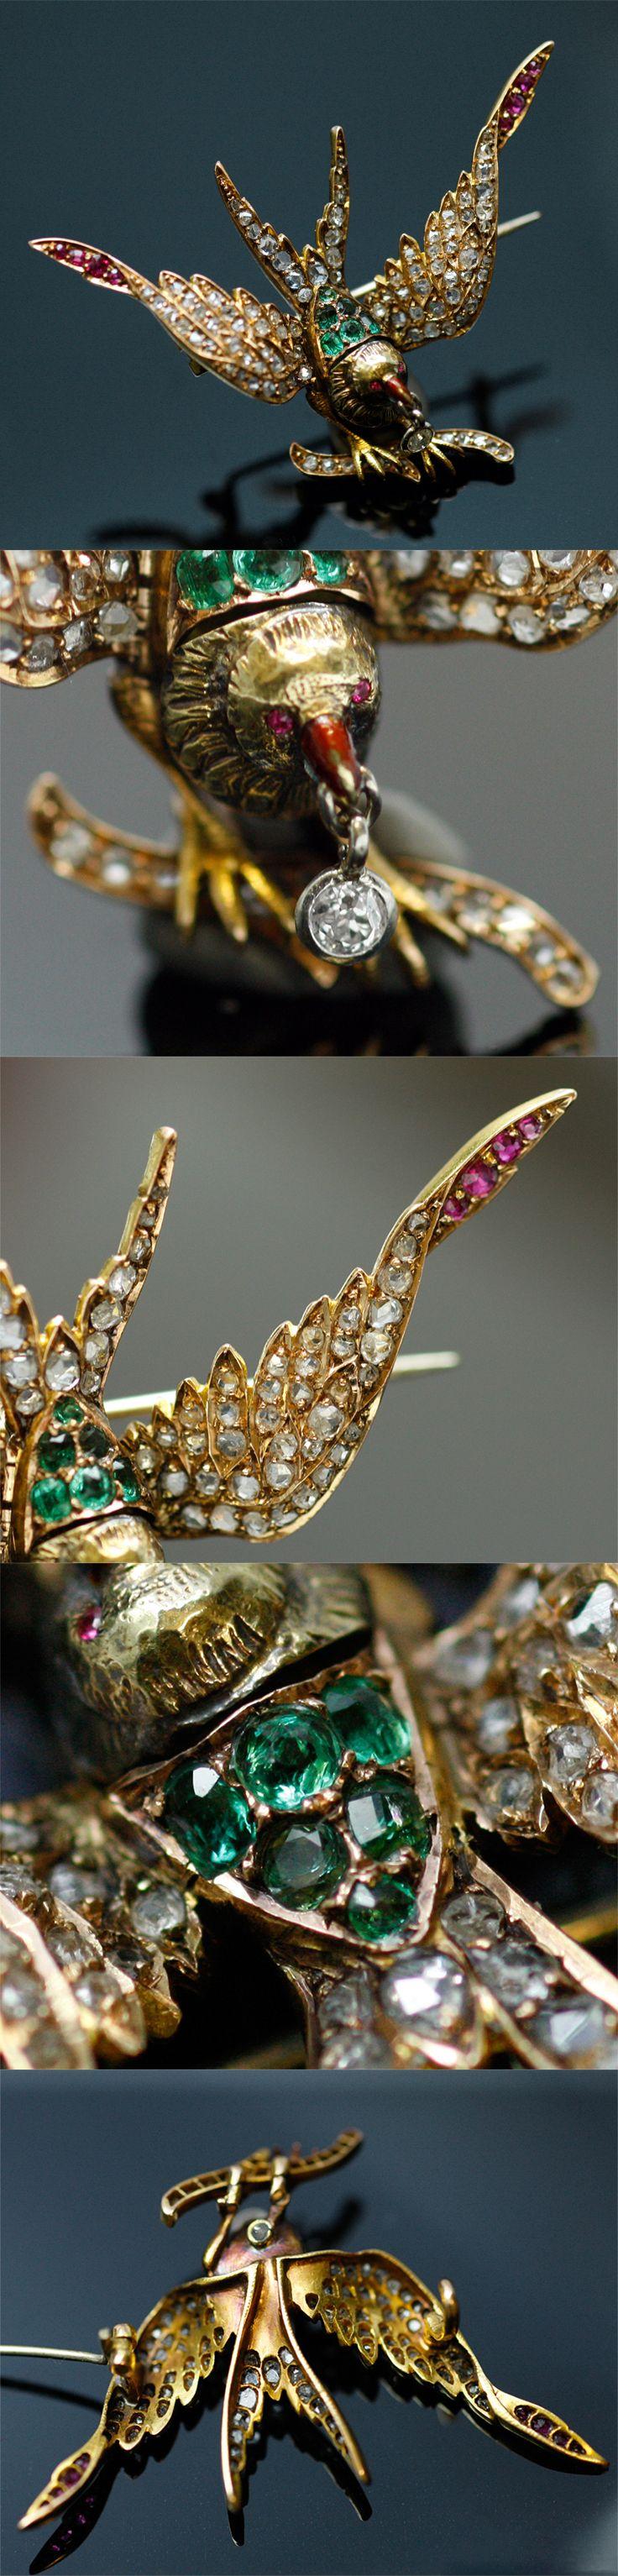 Emerald, ruby and diamond bird brooch, France, ca. 1860-1880, emaralds, rubies diamond, 18k gold enamel, 5.2 × 3.6cm, 9.1g